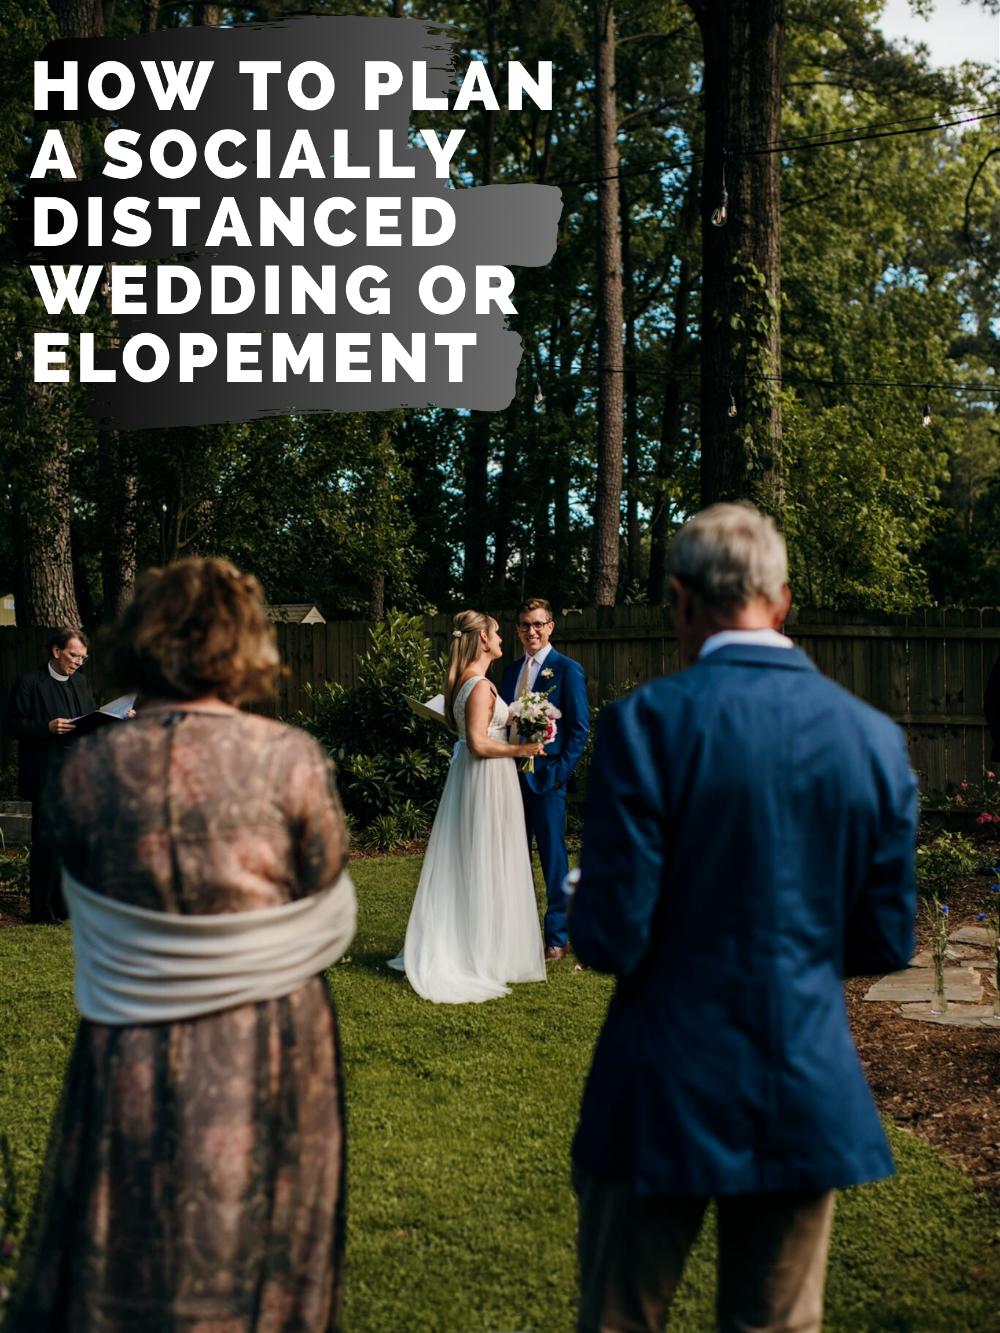 Pin on Social Distancing Wedding